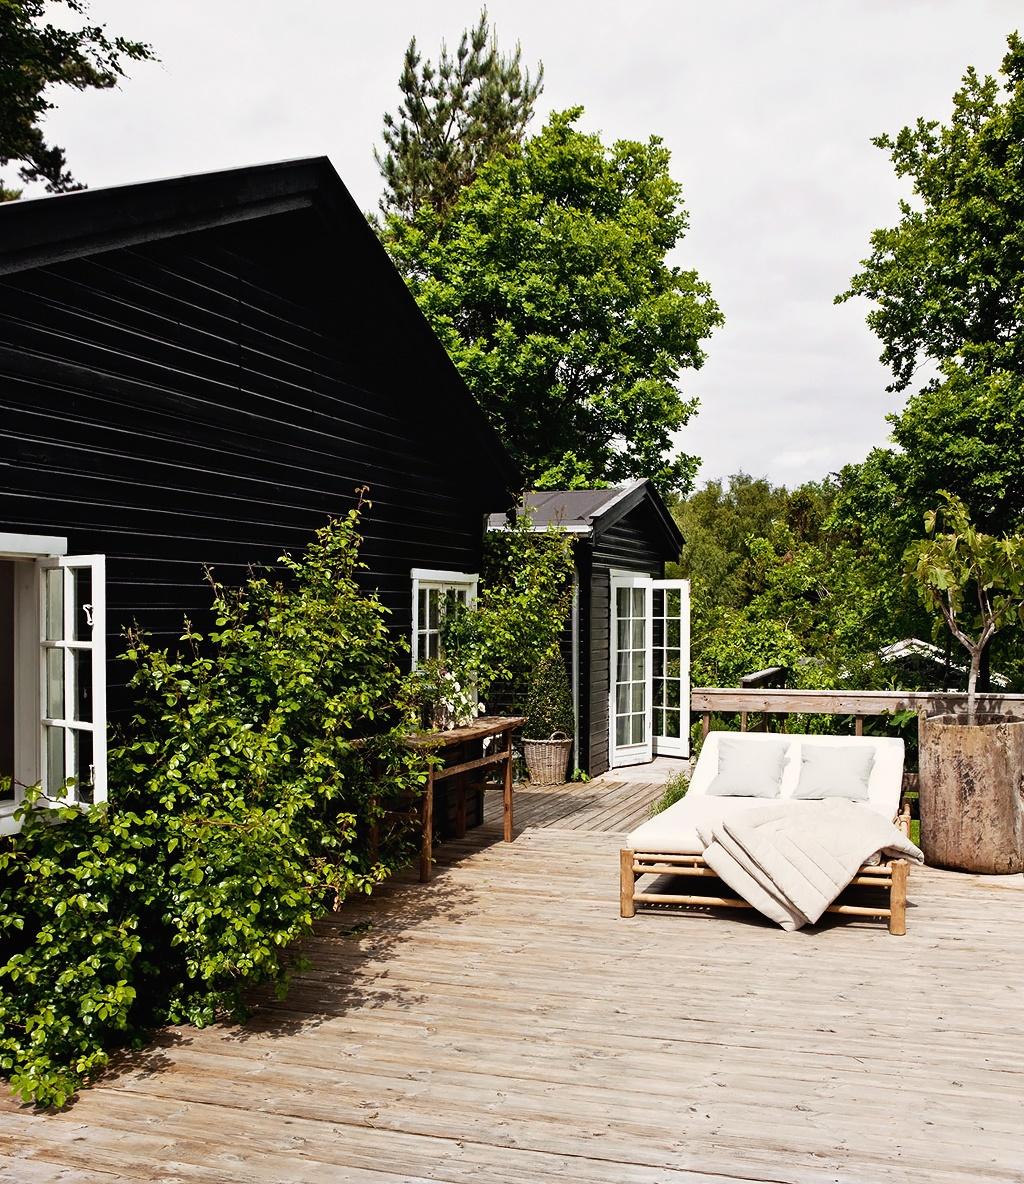 Casa-de-Verano-Escandinava-Cama-Exterior